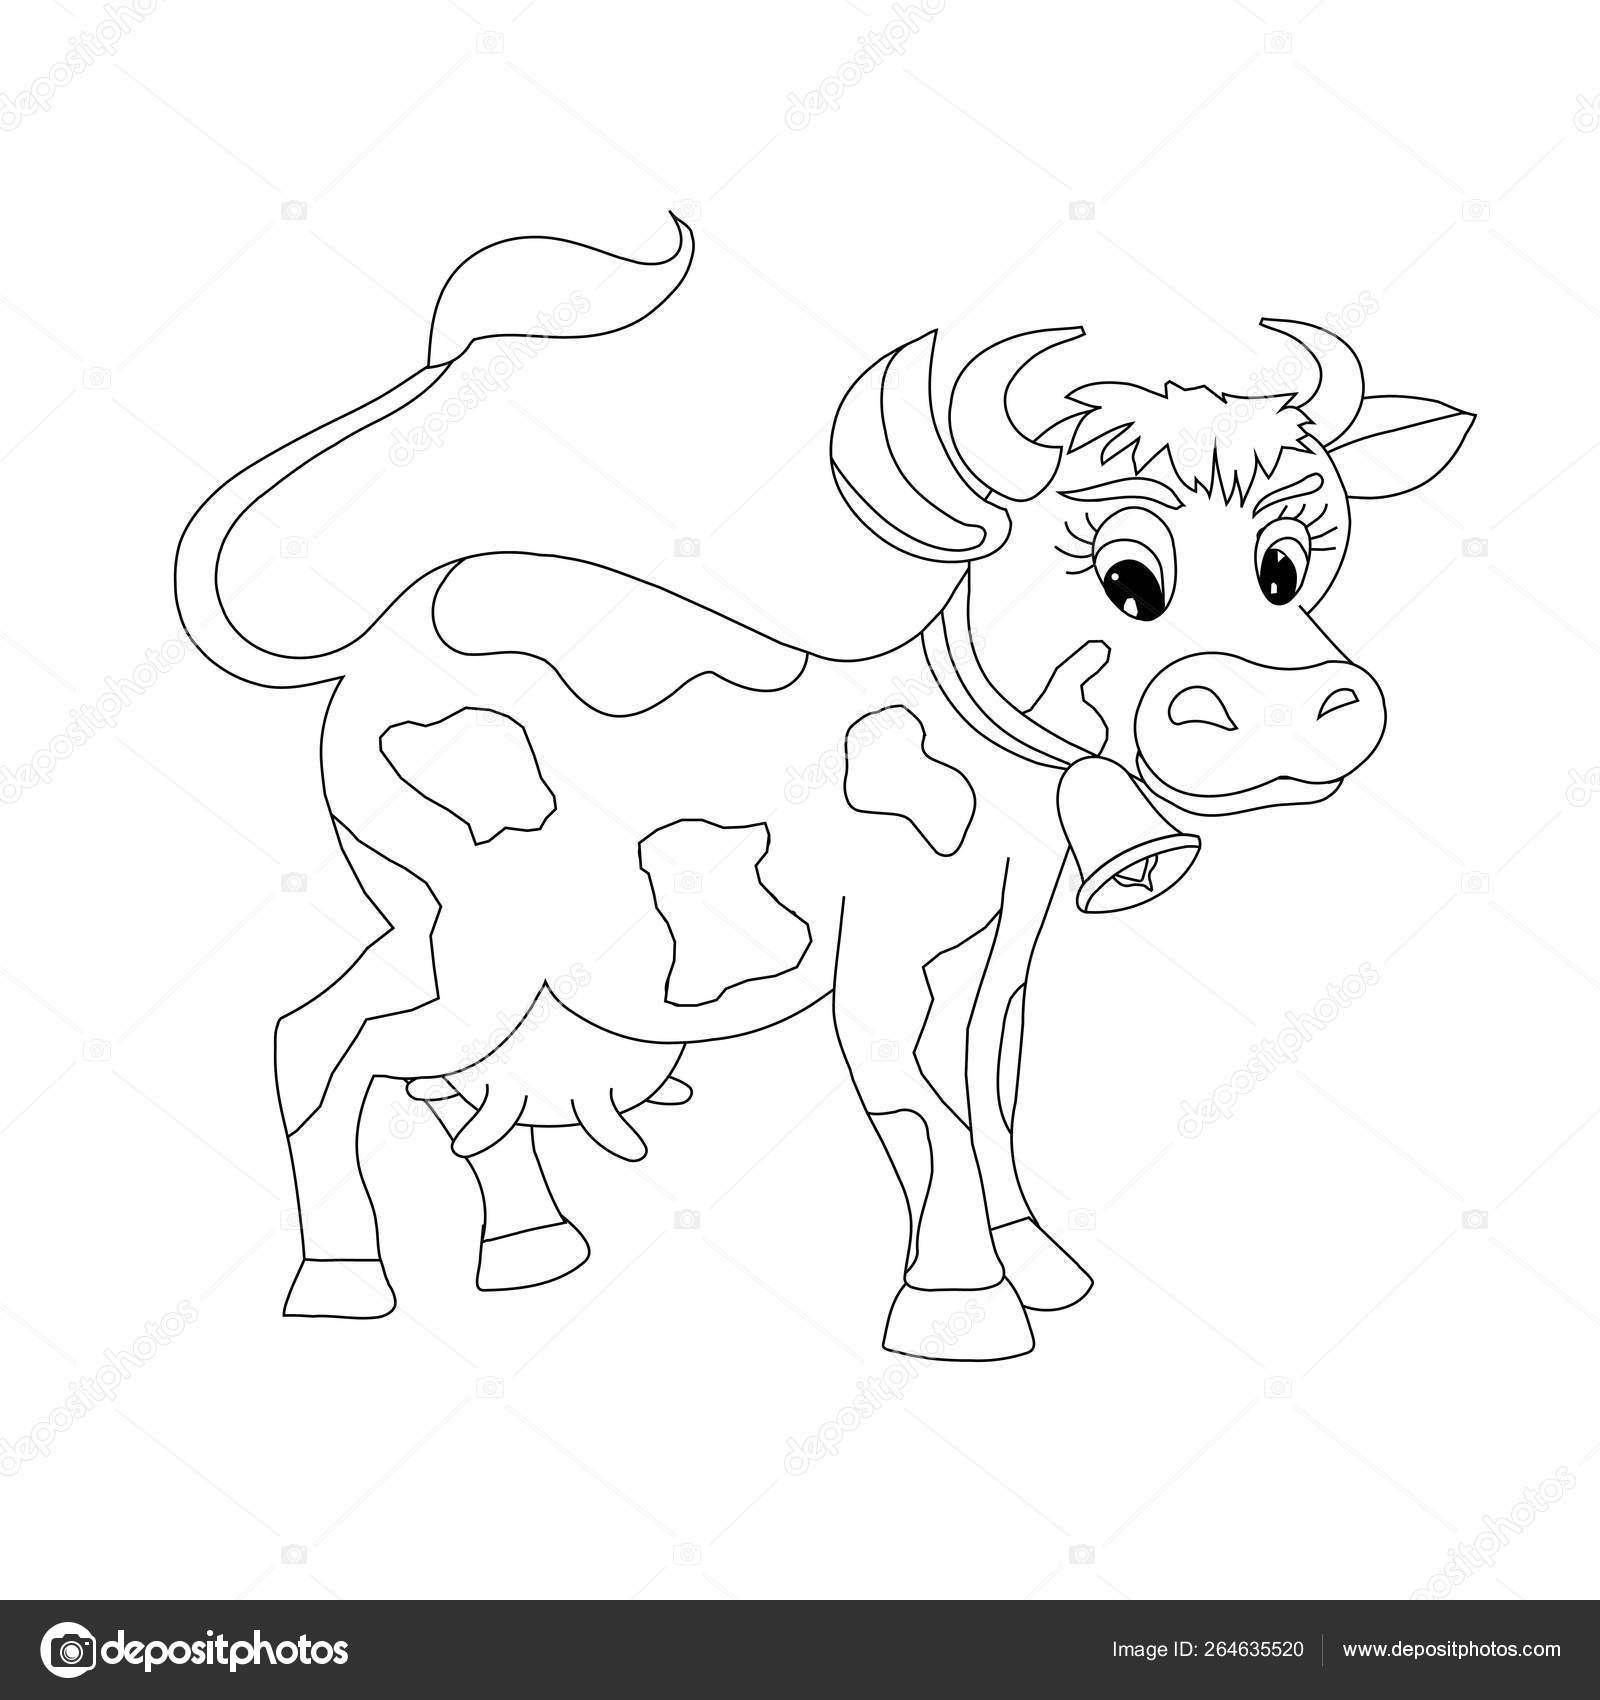 Cow Sketch Design Element Cartoons Funny Farm Animal Web